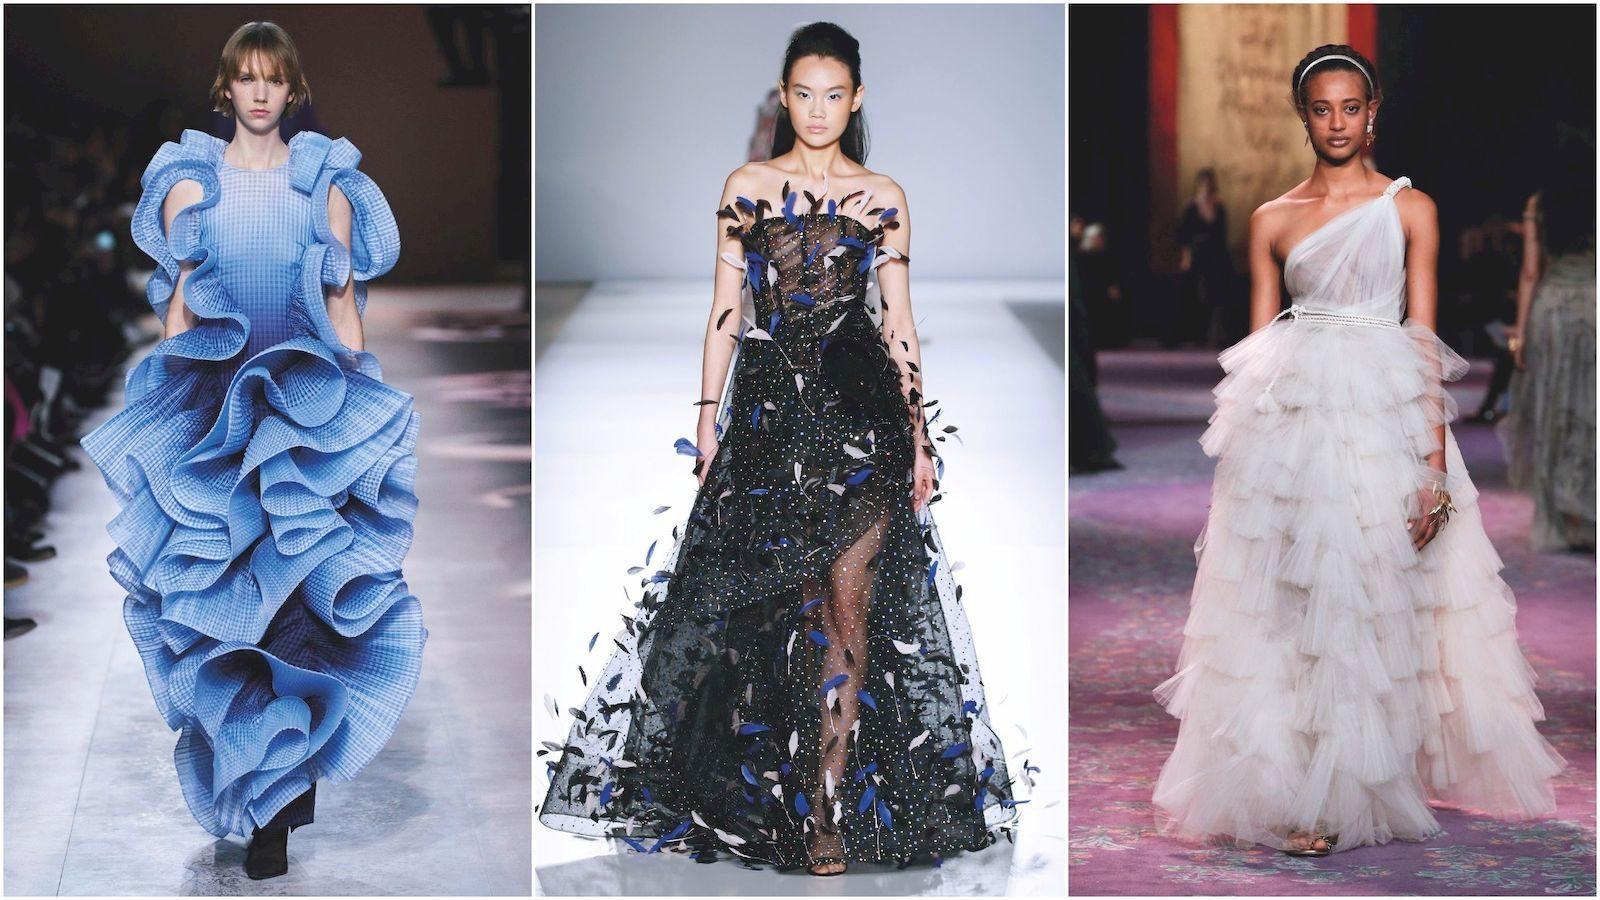 haute couture มีวัตถุประสงค์อะไร?